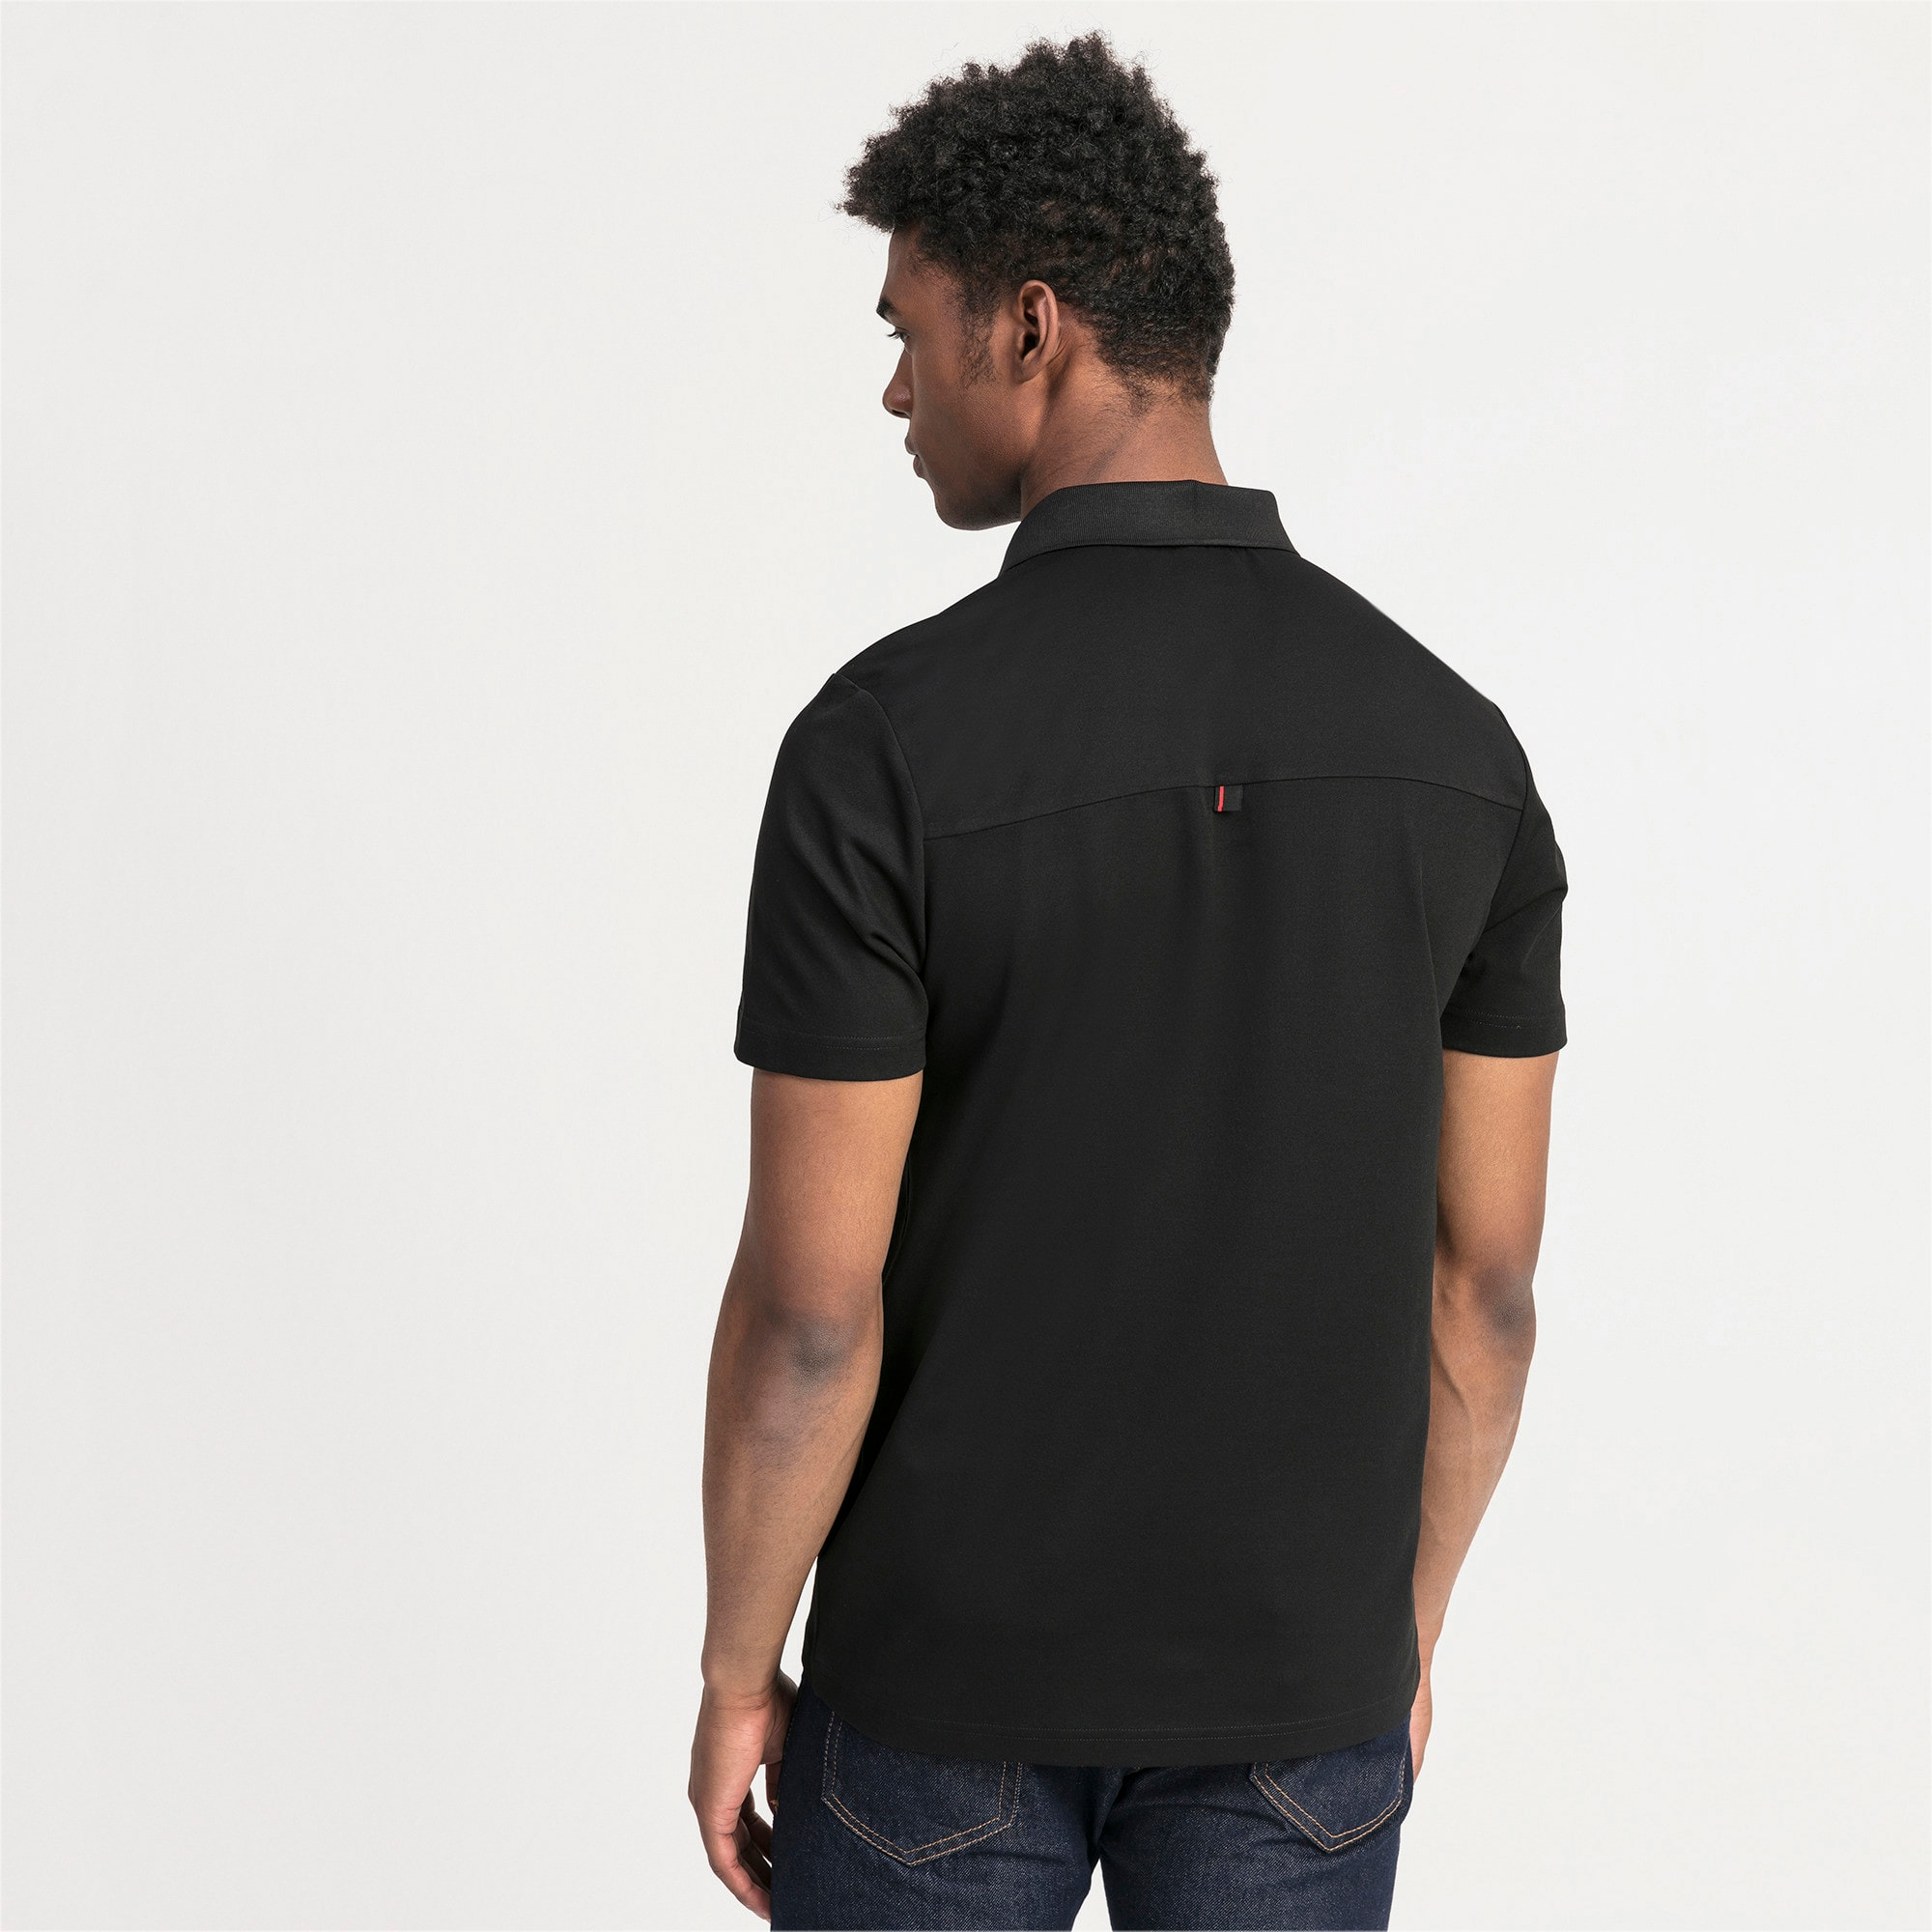 Thumbnail 2 of Ferrari Men's Polo Shirt, Puma Black, medium